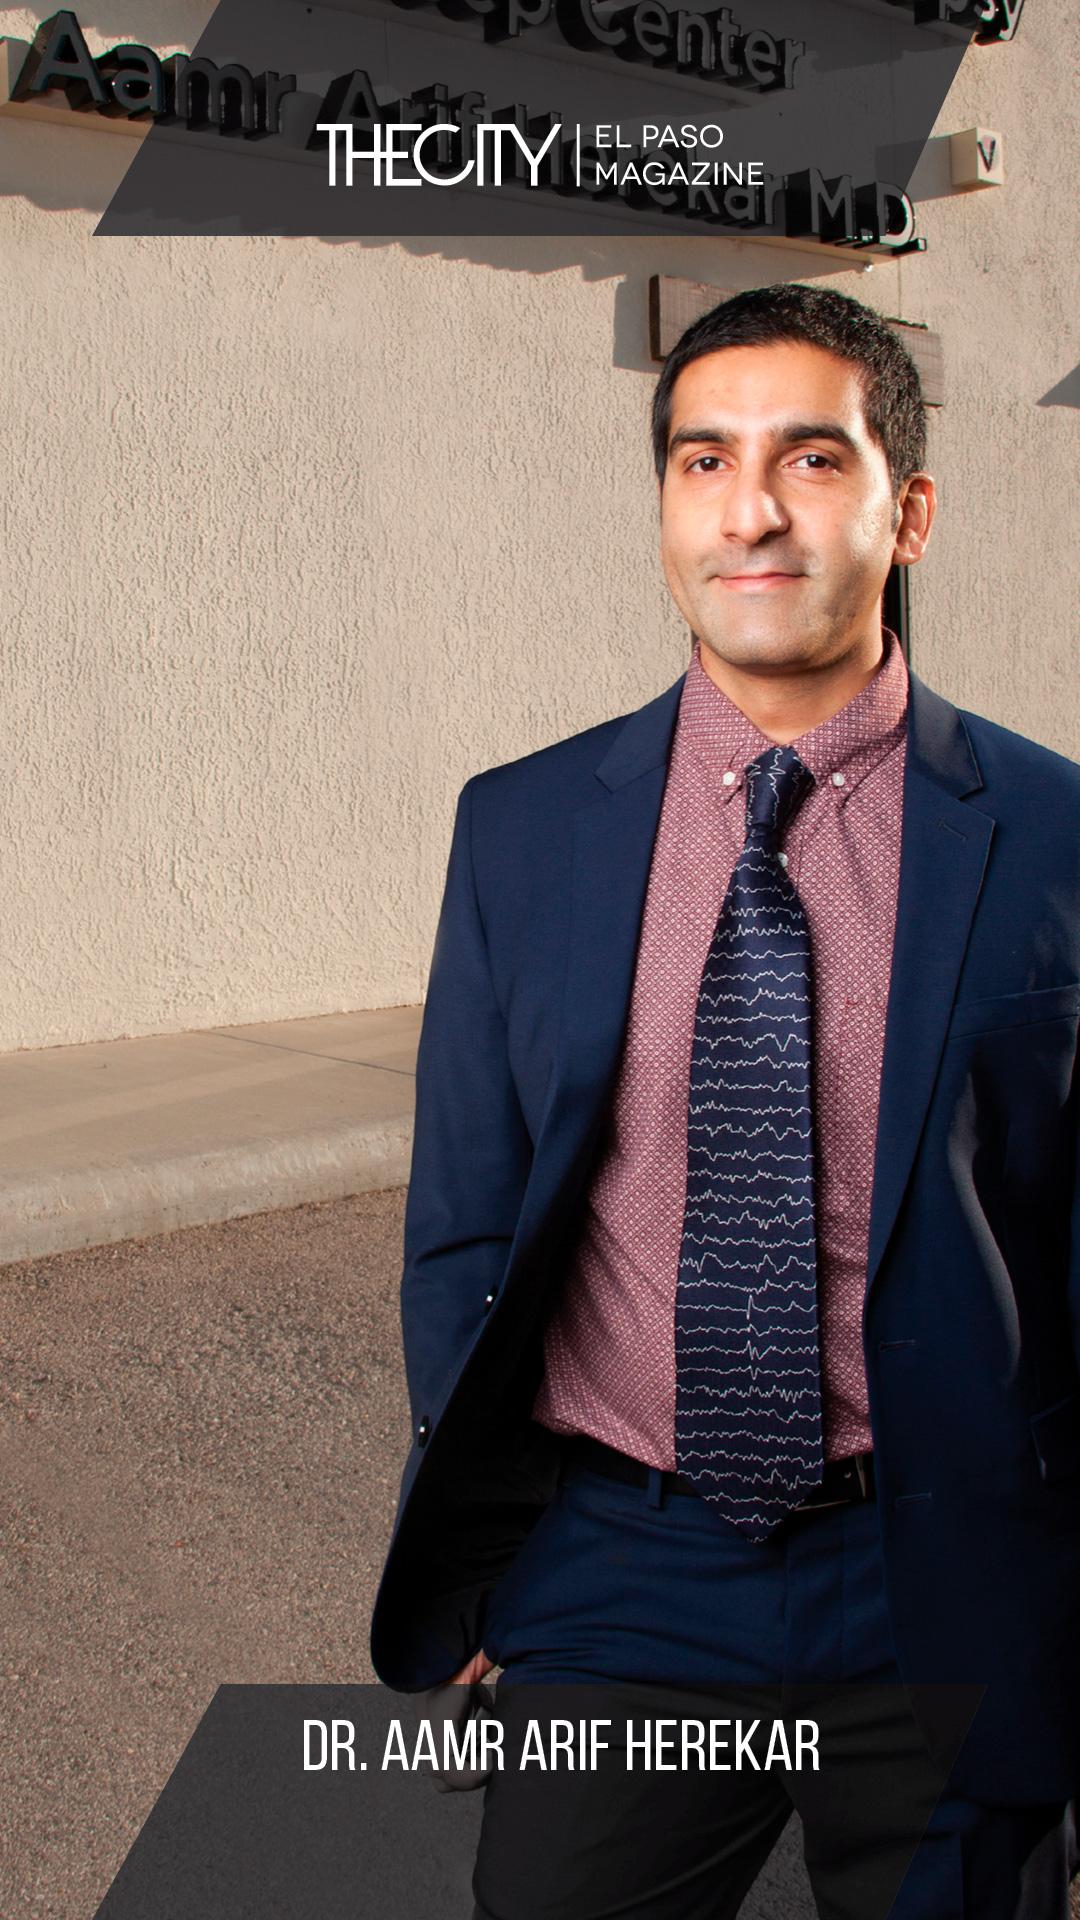 Healthcare Professionals: Dr. aamr arif Herekar